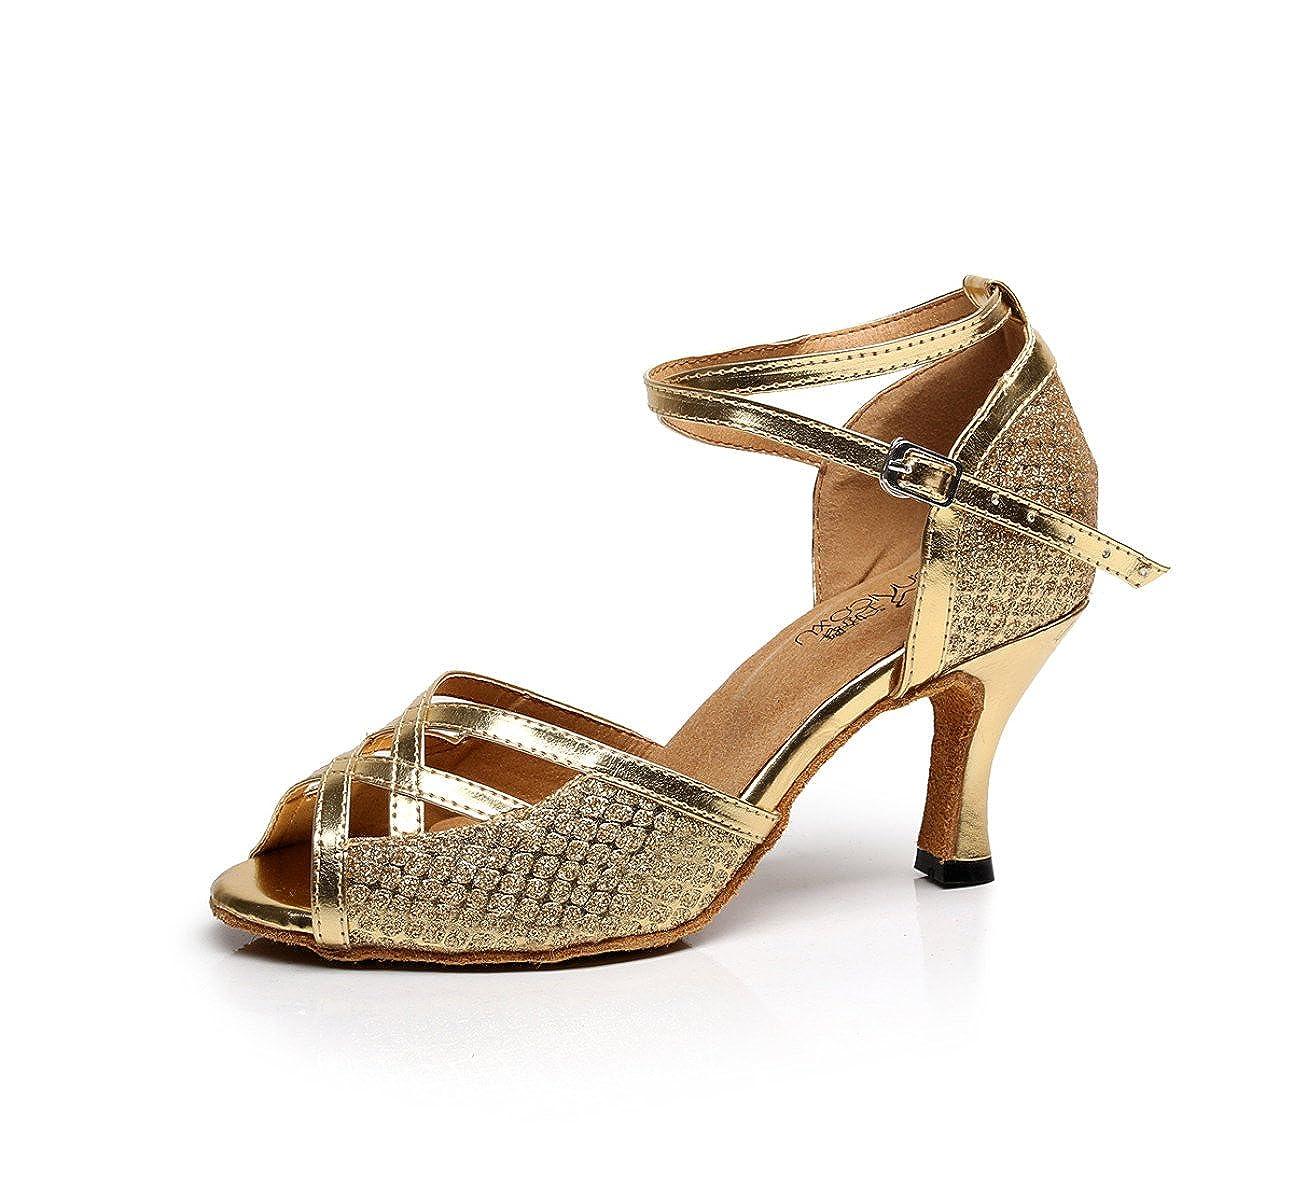 JSHOE Chaussures de Danse pour 19994 B00MY4MVGQ Femmes Latin Salsa pour/Tango/Thé/Samba/Moderne/Jazz Chaussures Sandales Talons Hauts,Gold-heeled8.5cm-UK7/EU41/Our42 - 4dbd072 - gis9ma7le.space